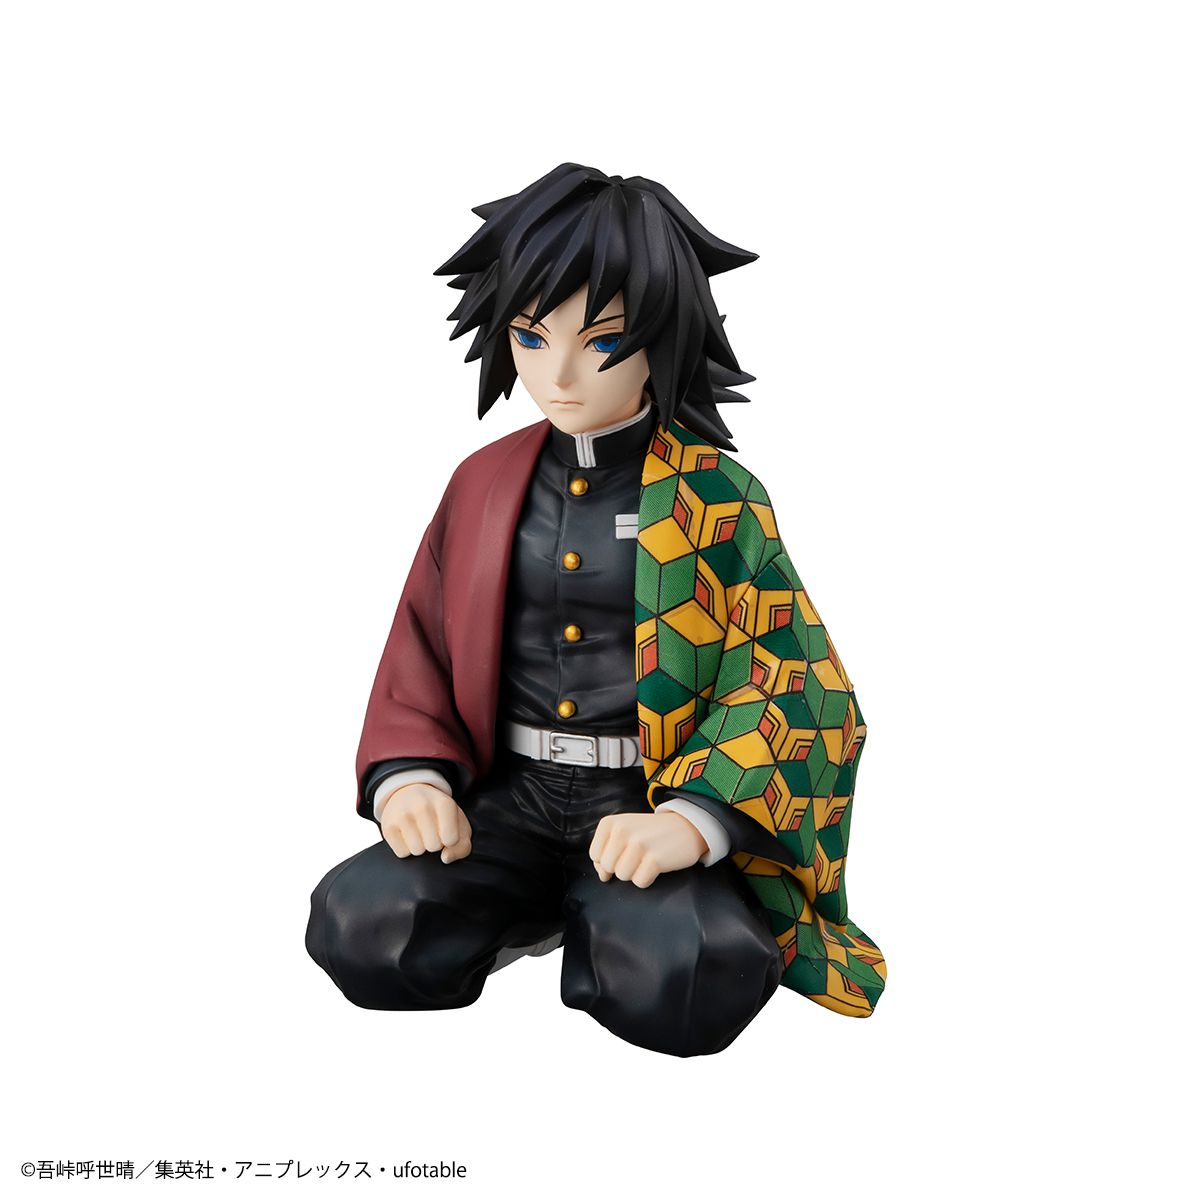 Tomioka_3 - Figura semanal (1-7-03-2021) - Hanami Dango